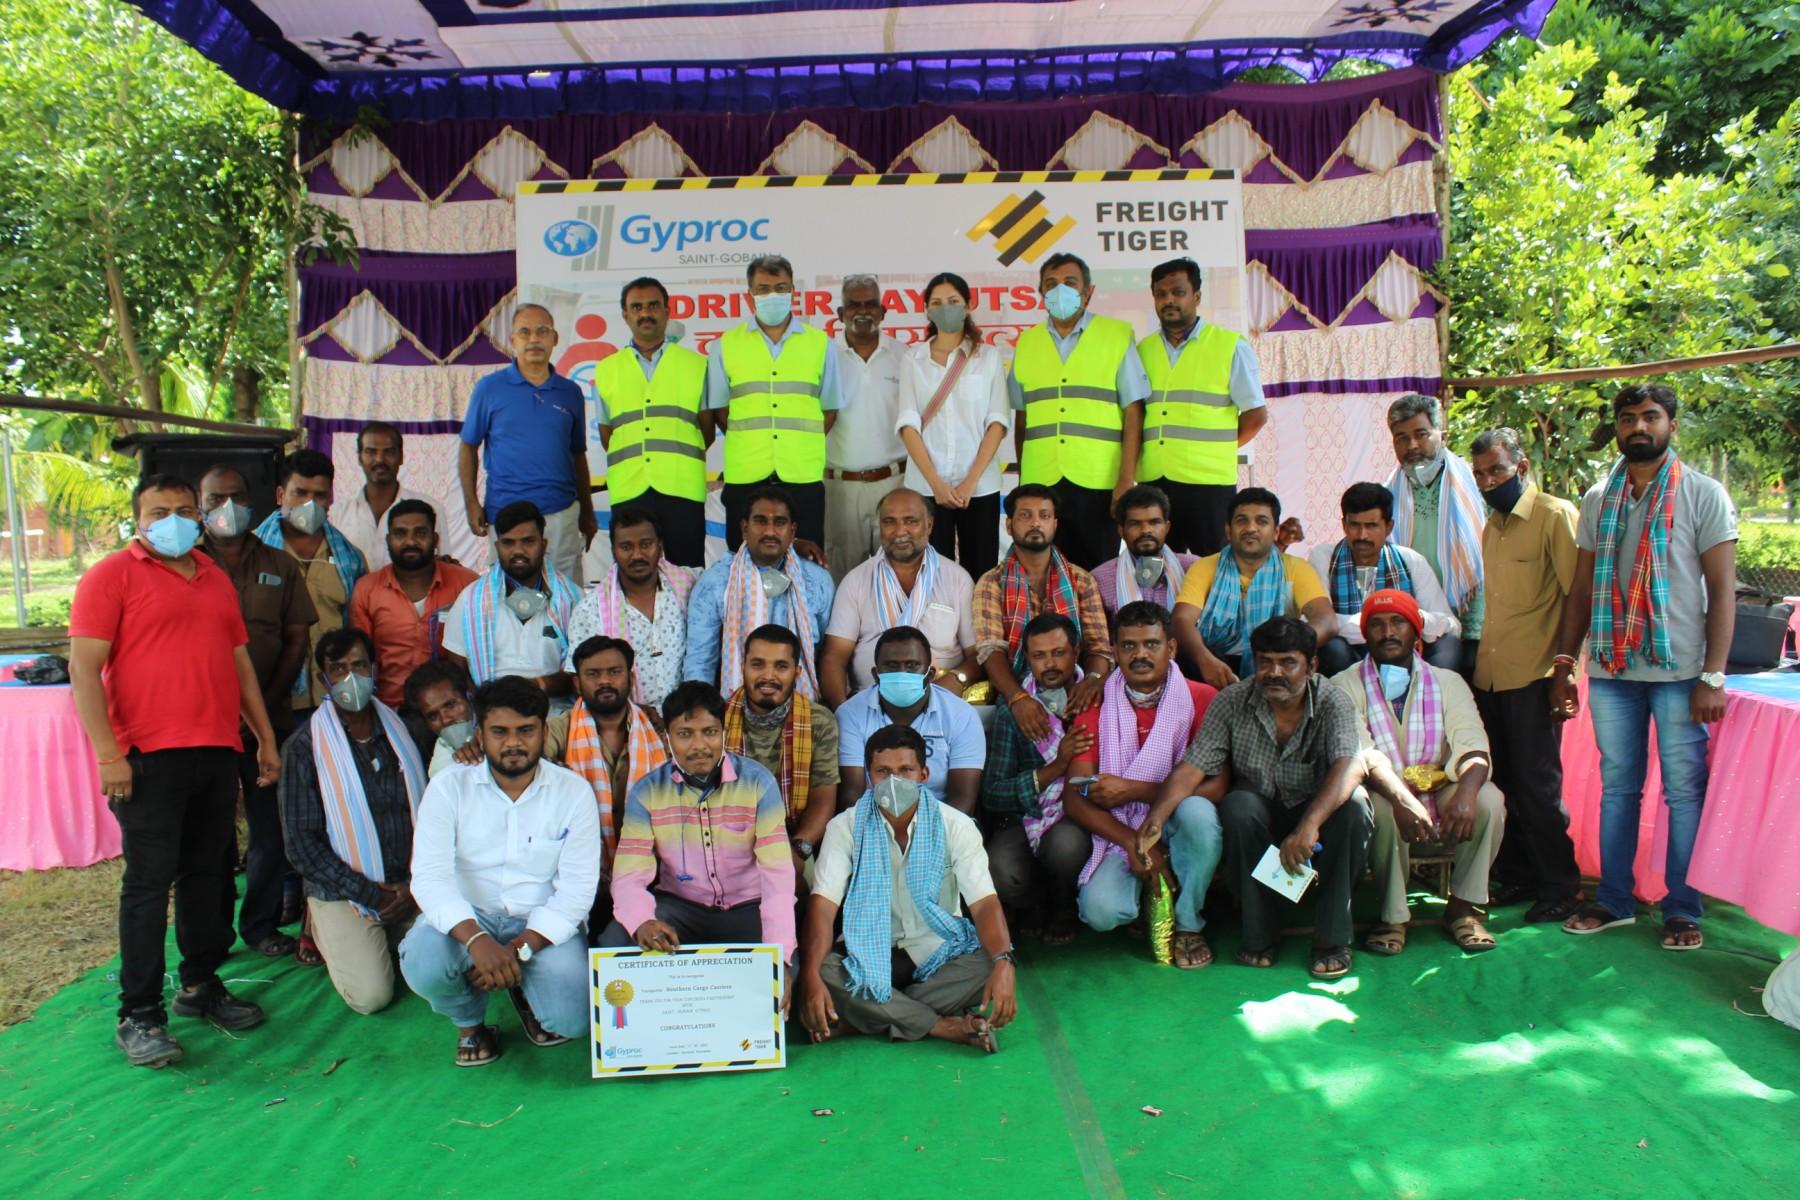 Drivers Day Utsav- thoda jamke with Freight Tiger, Saint Gobain Gyproc and Transport Mitra